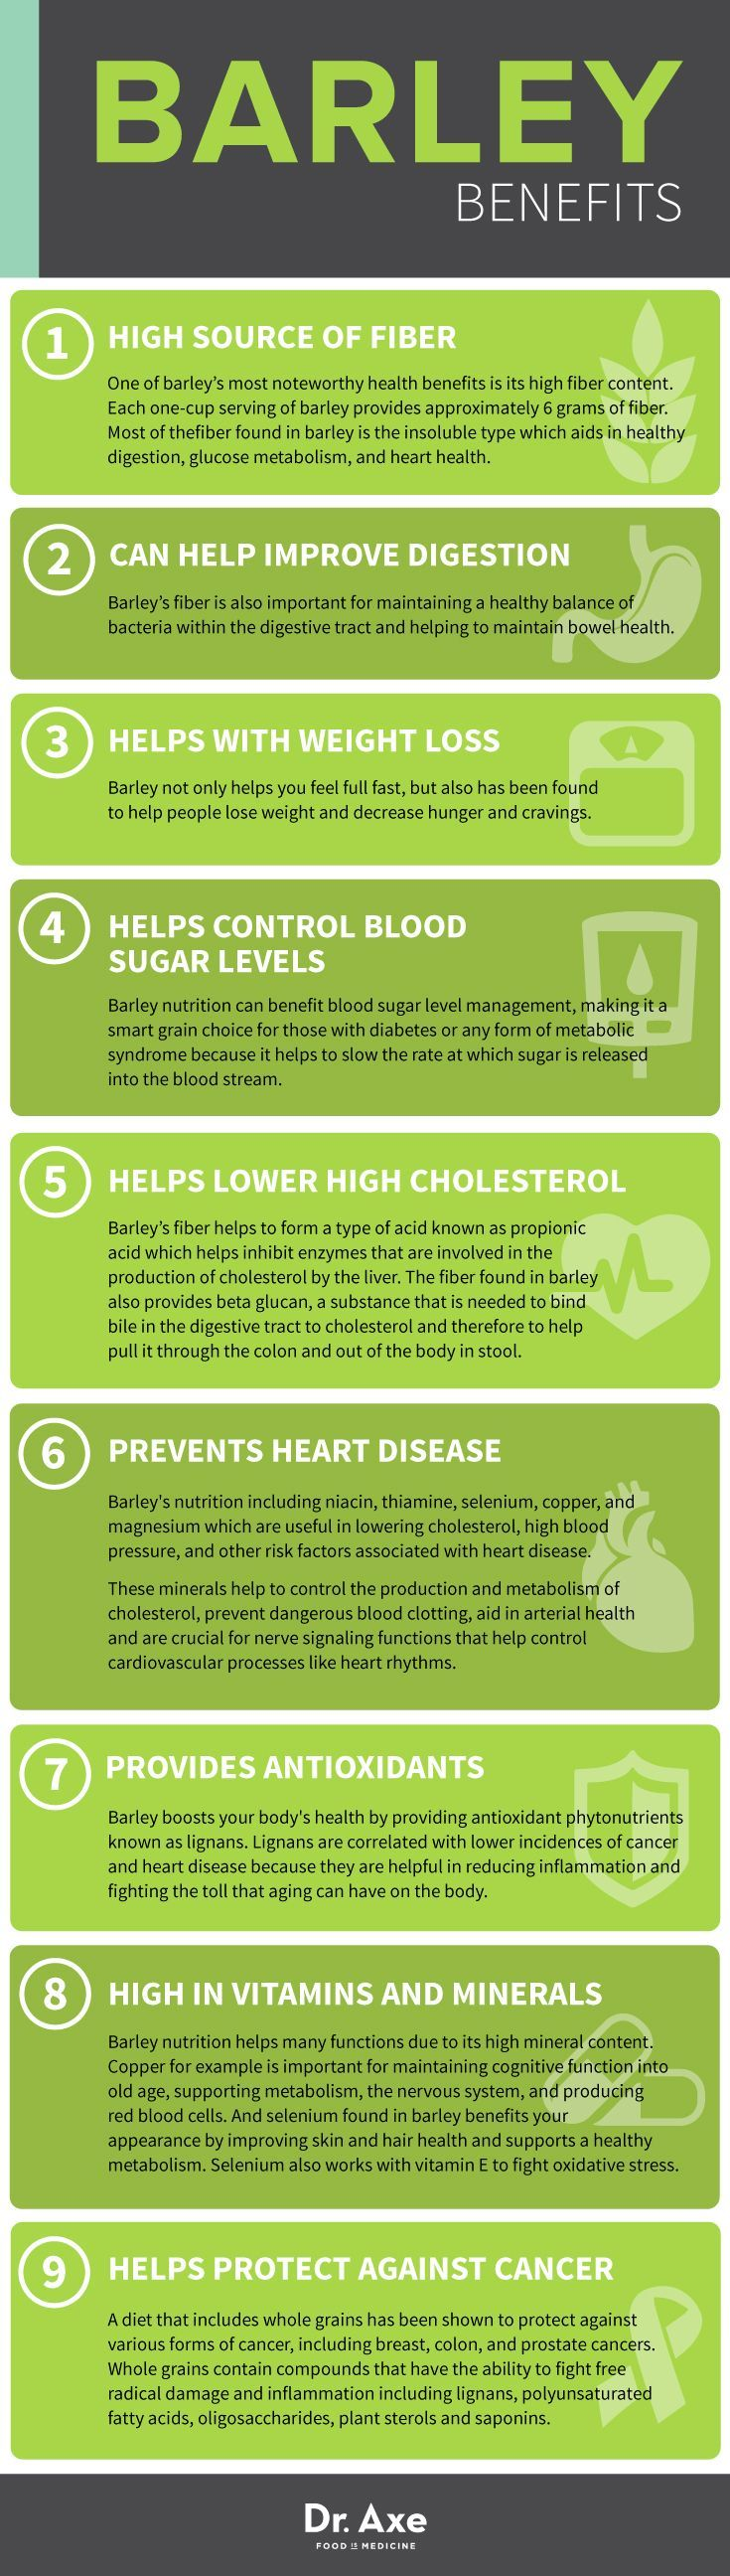 Barley Benefits http://www.draxe.com #health #holistic #natural